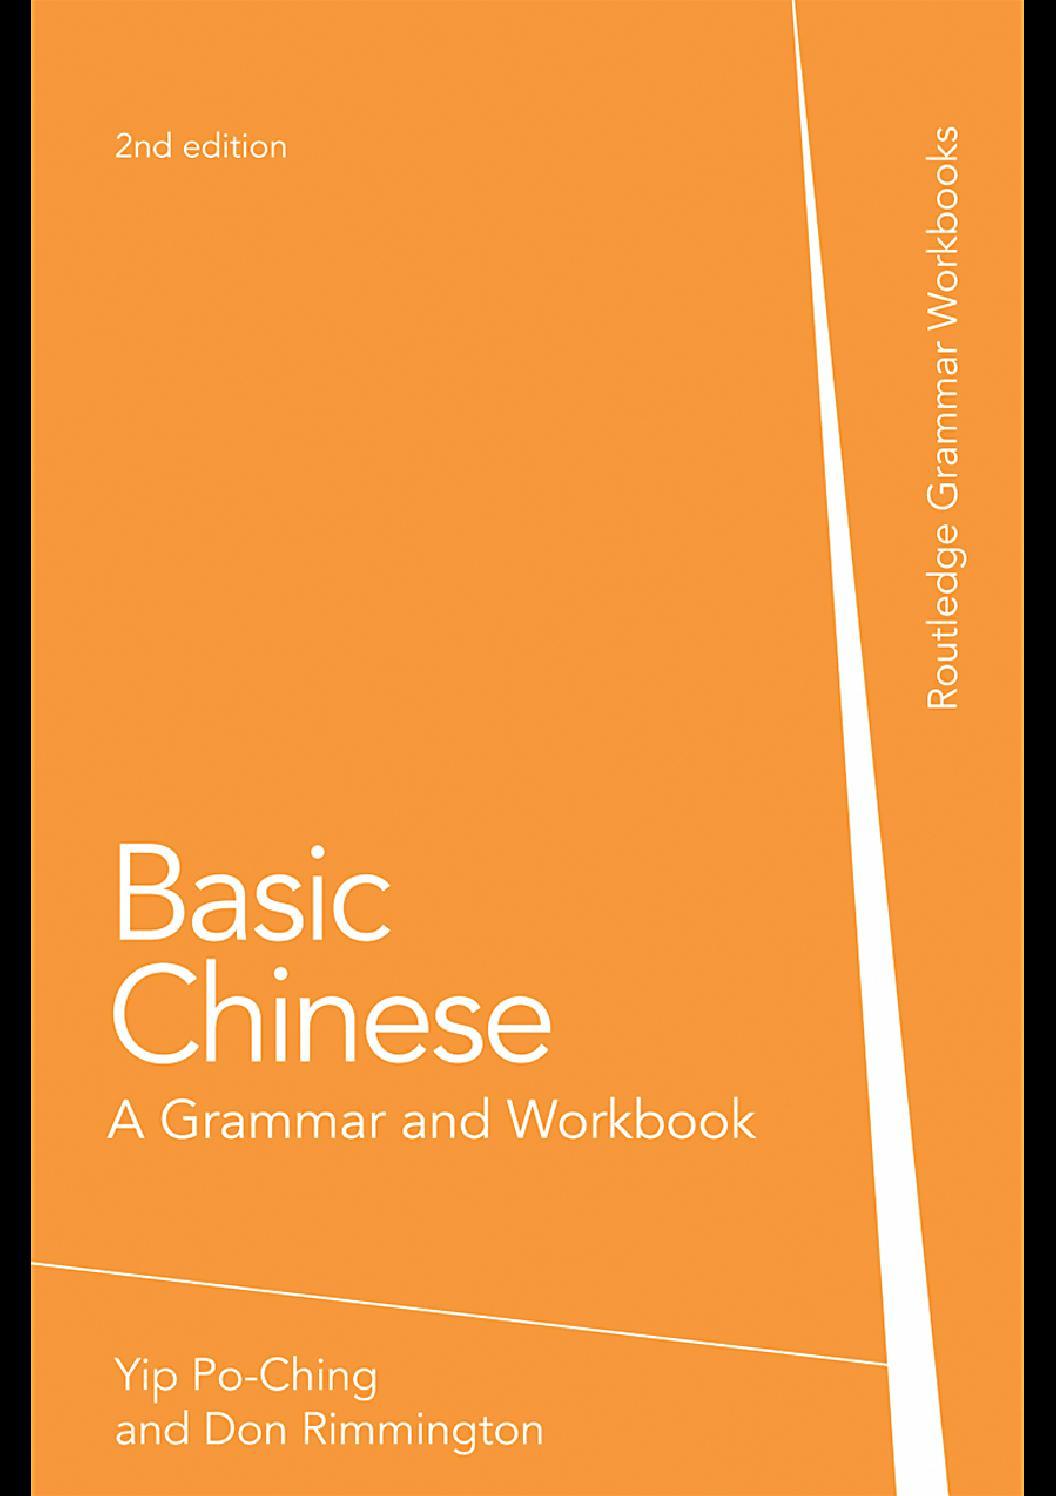 Basic chinese a grammar and workbook by MT Villanueva - issuu